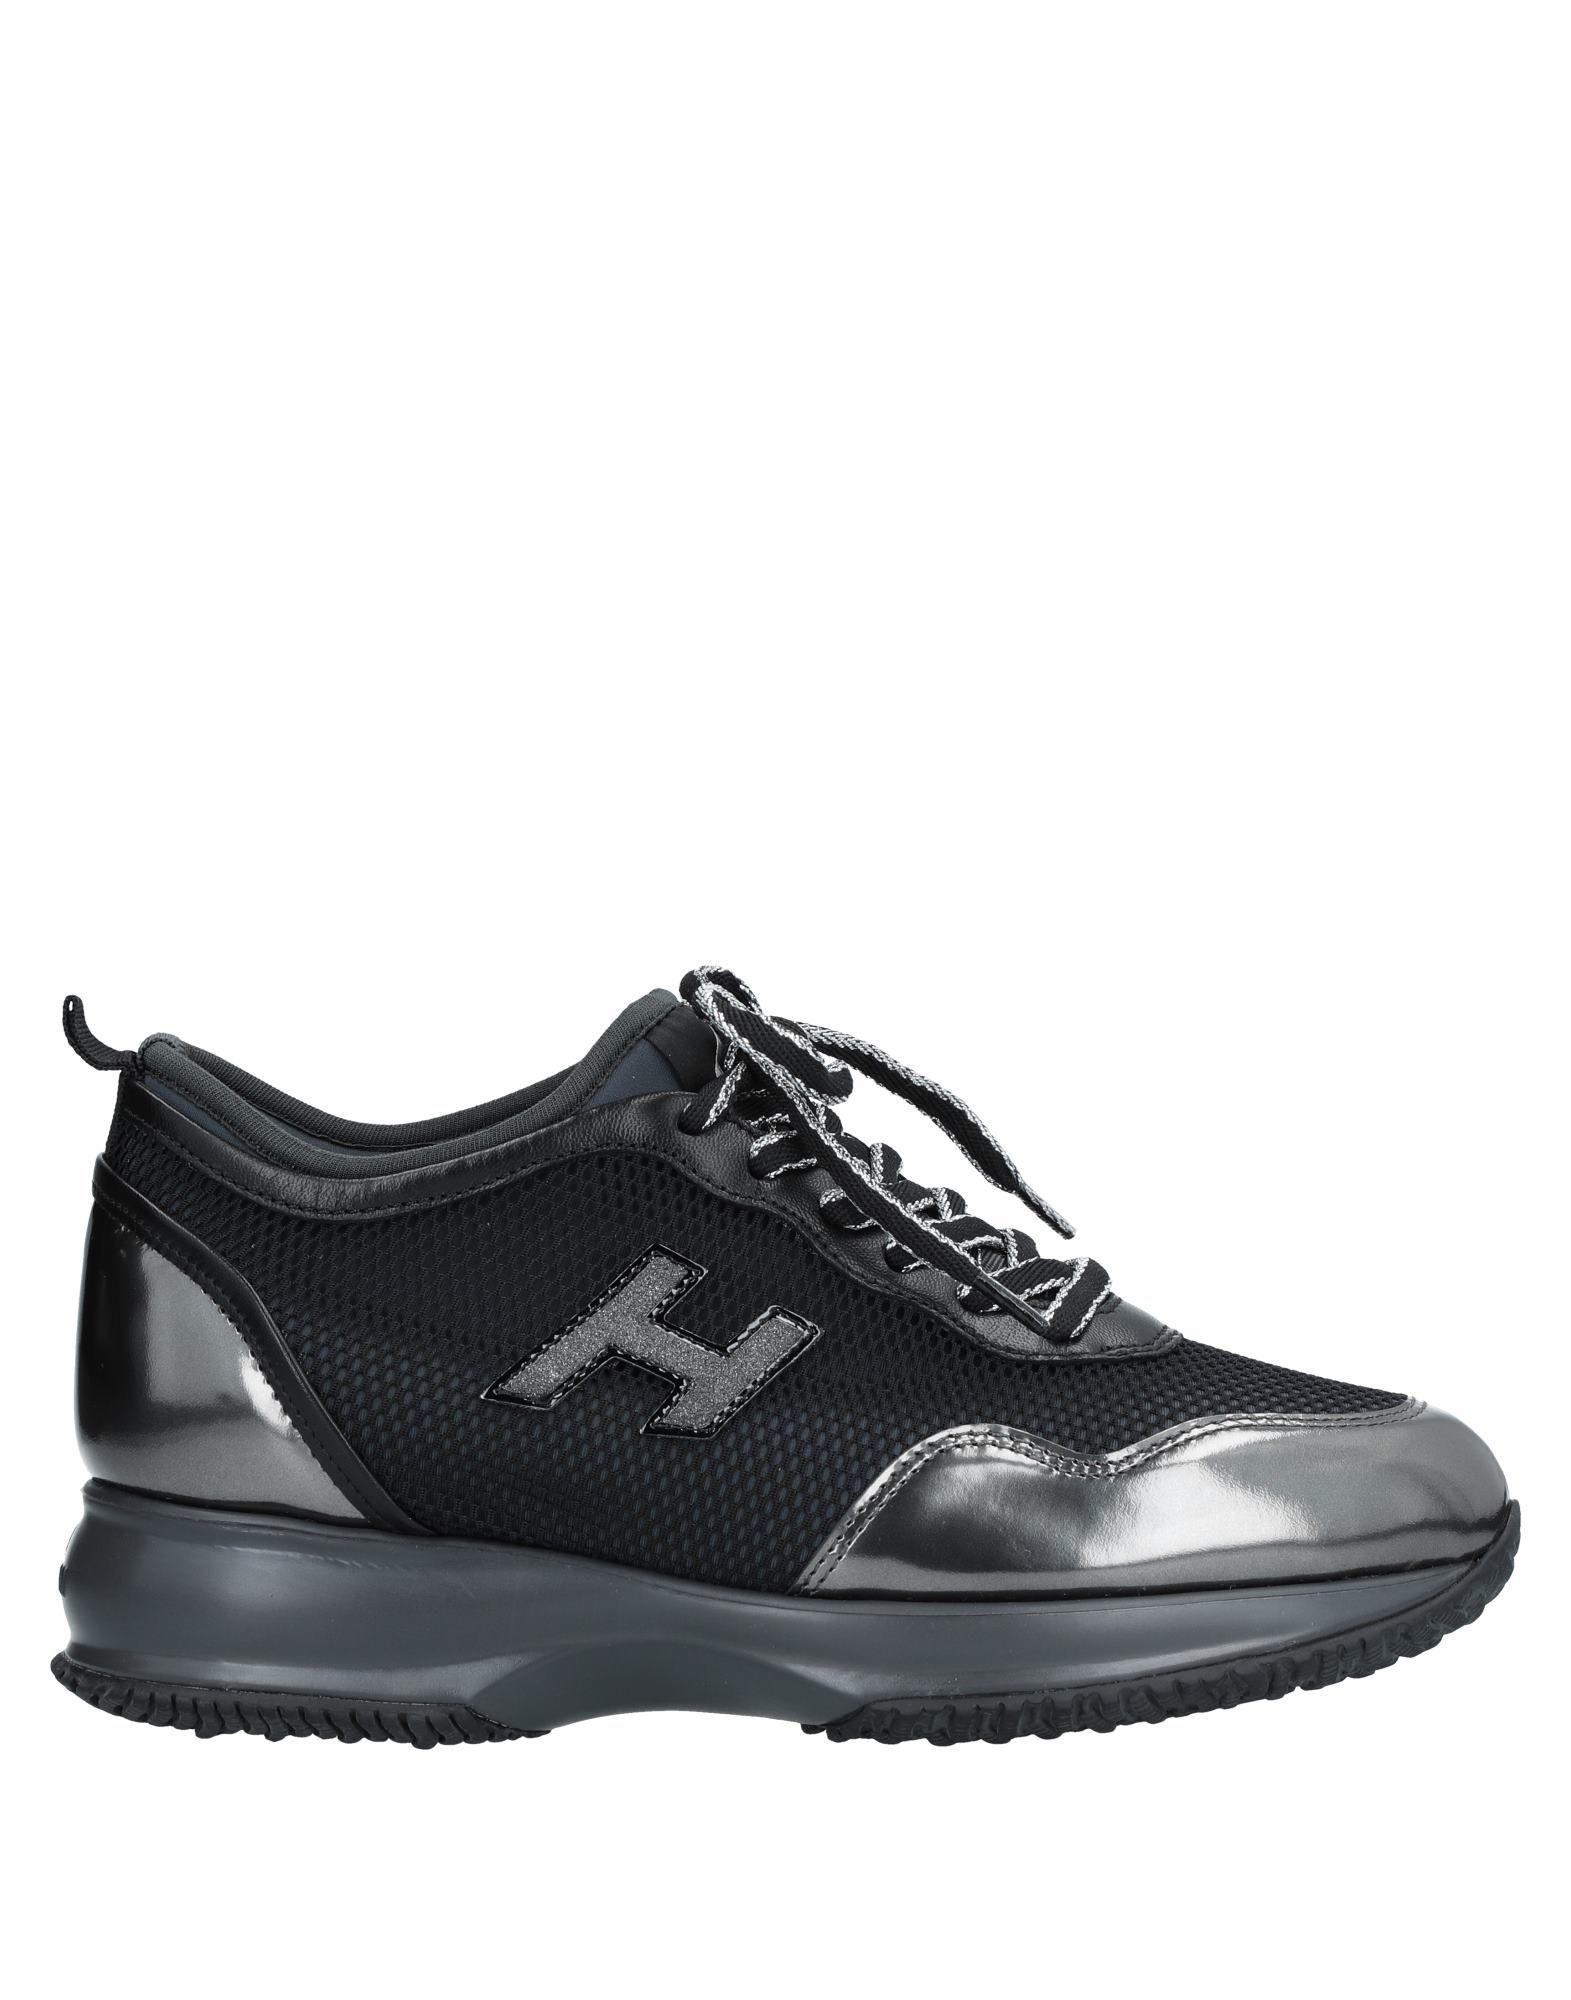 Sneakers Hogan Donna - 11539050JI elegante